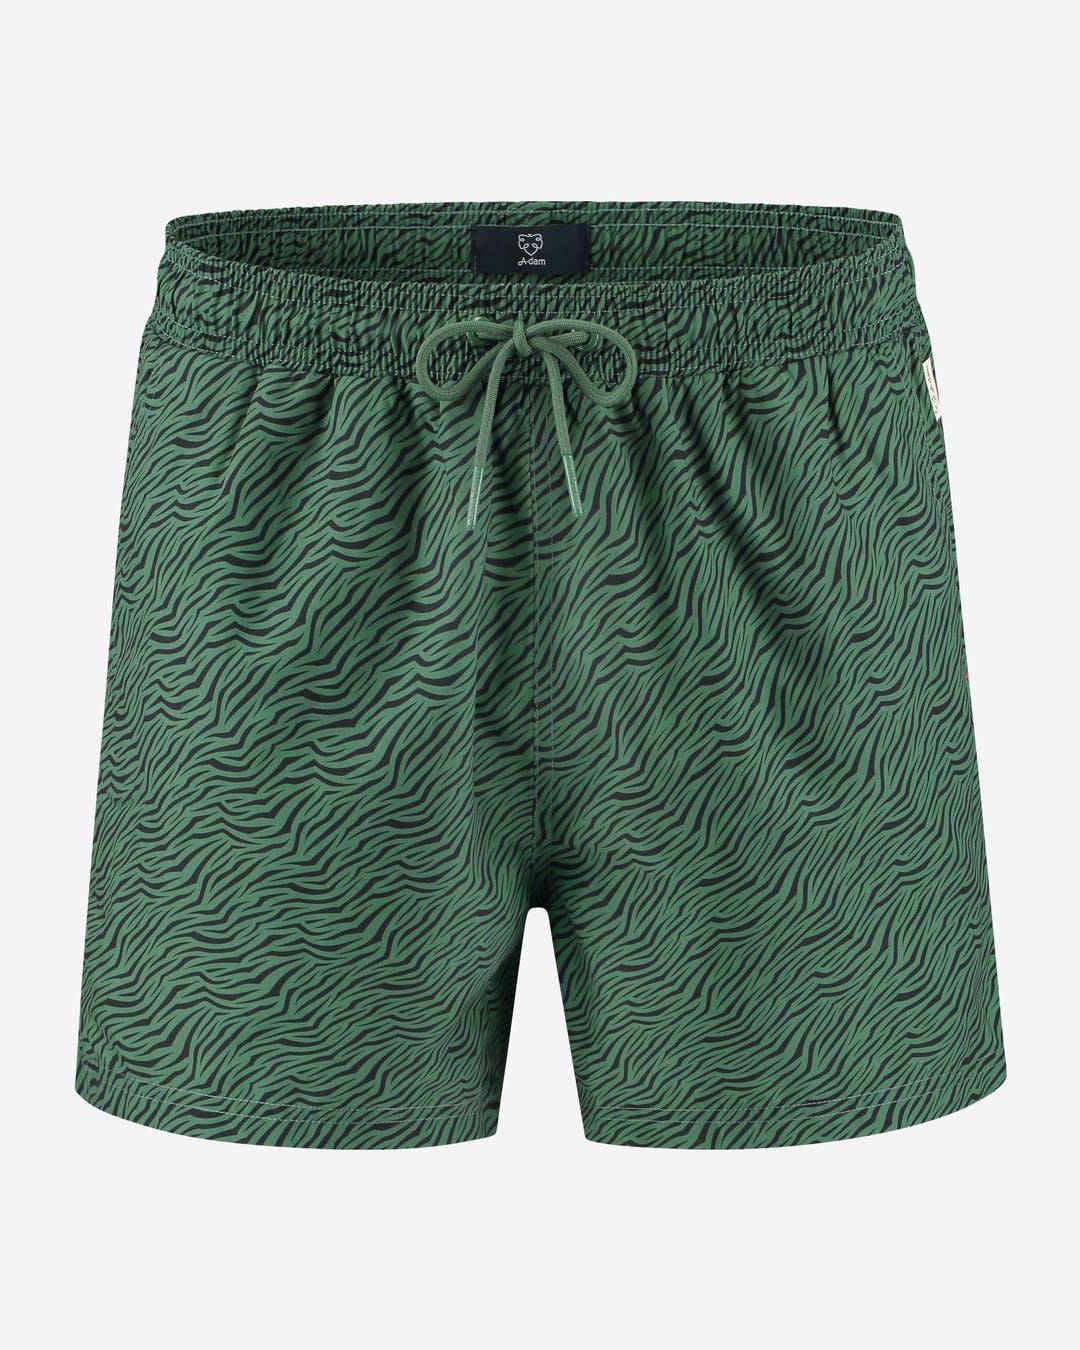 A-Dam Swimwear 1P Tiger green